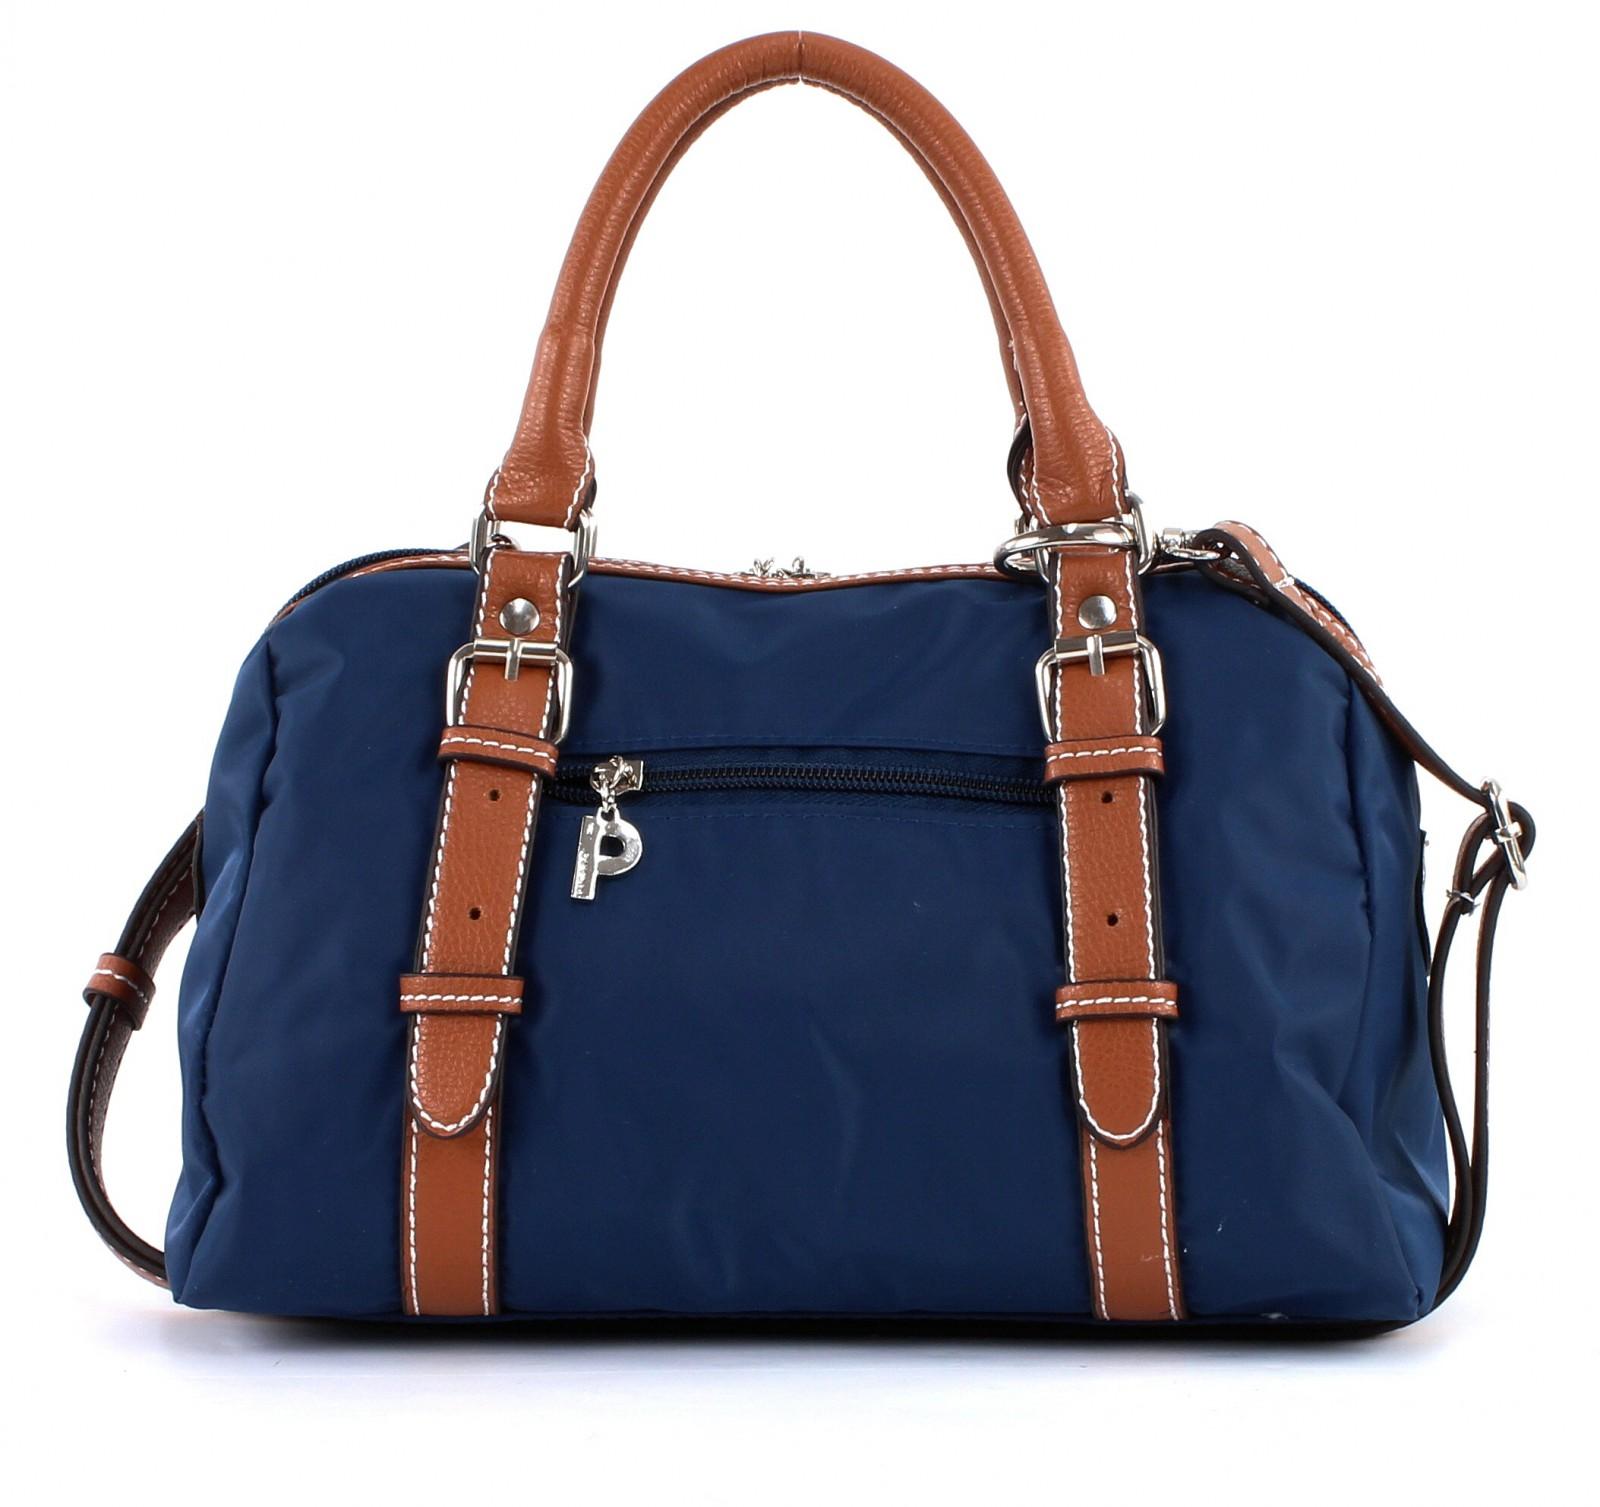 dc27ee5c42b1a PICARD Shoulder Bag Sonja S Handbag Ozean